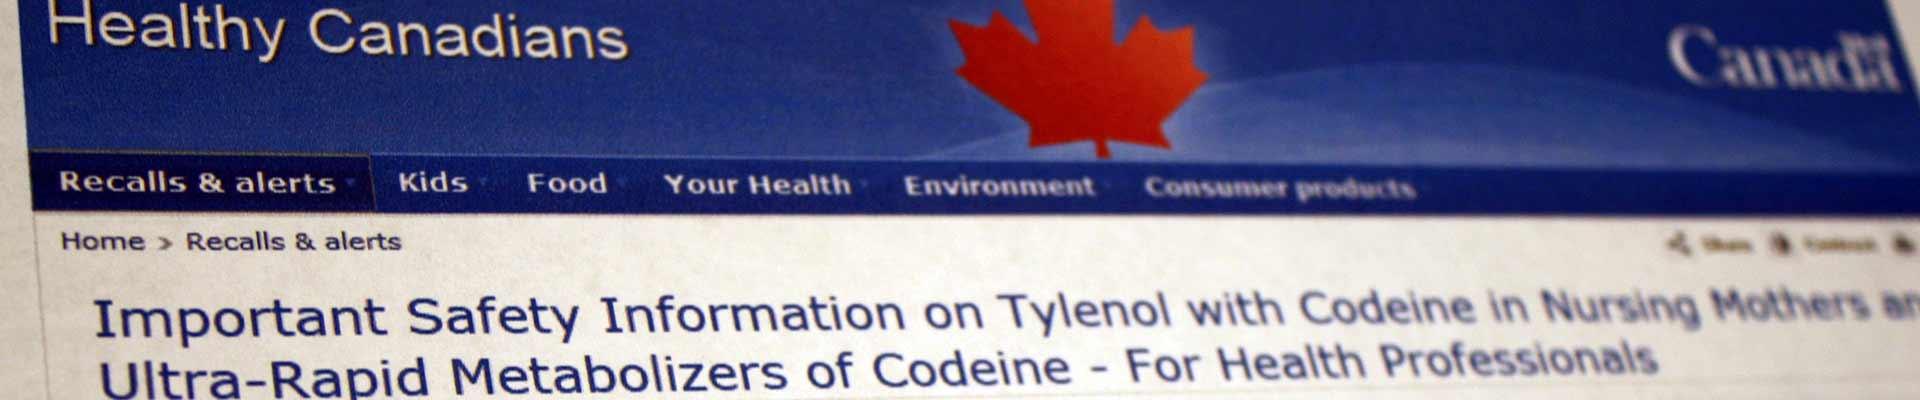 Health Canada bulletin